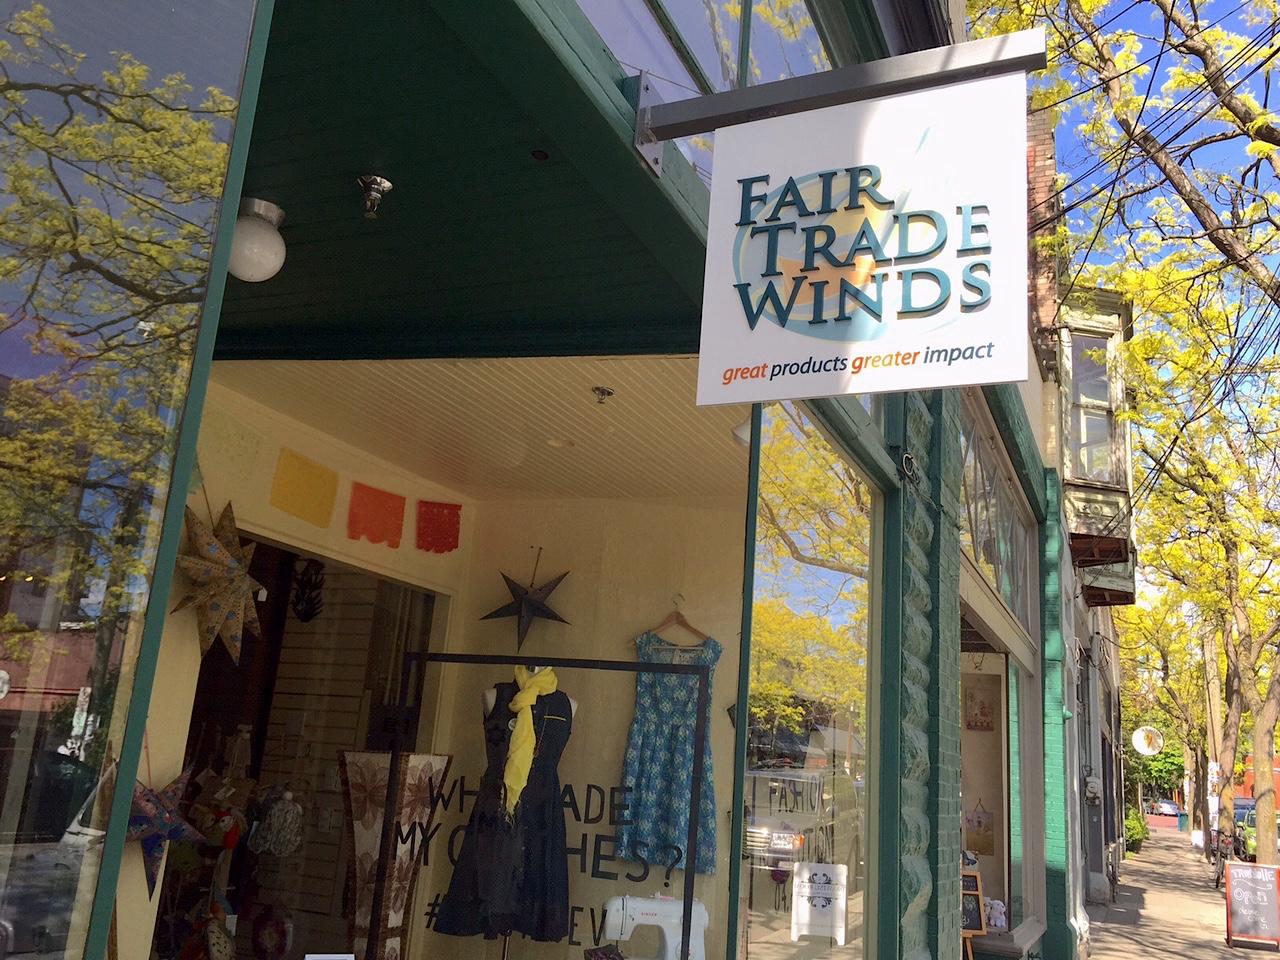 Fair Trade Gift Shop Everett Wa Fair Trade Winds Fair Trade Home Decor